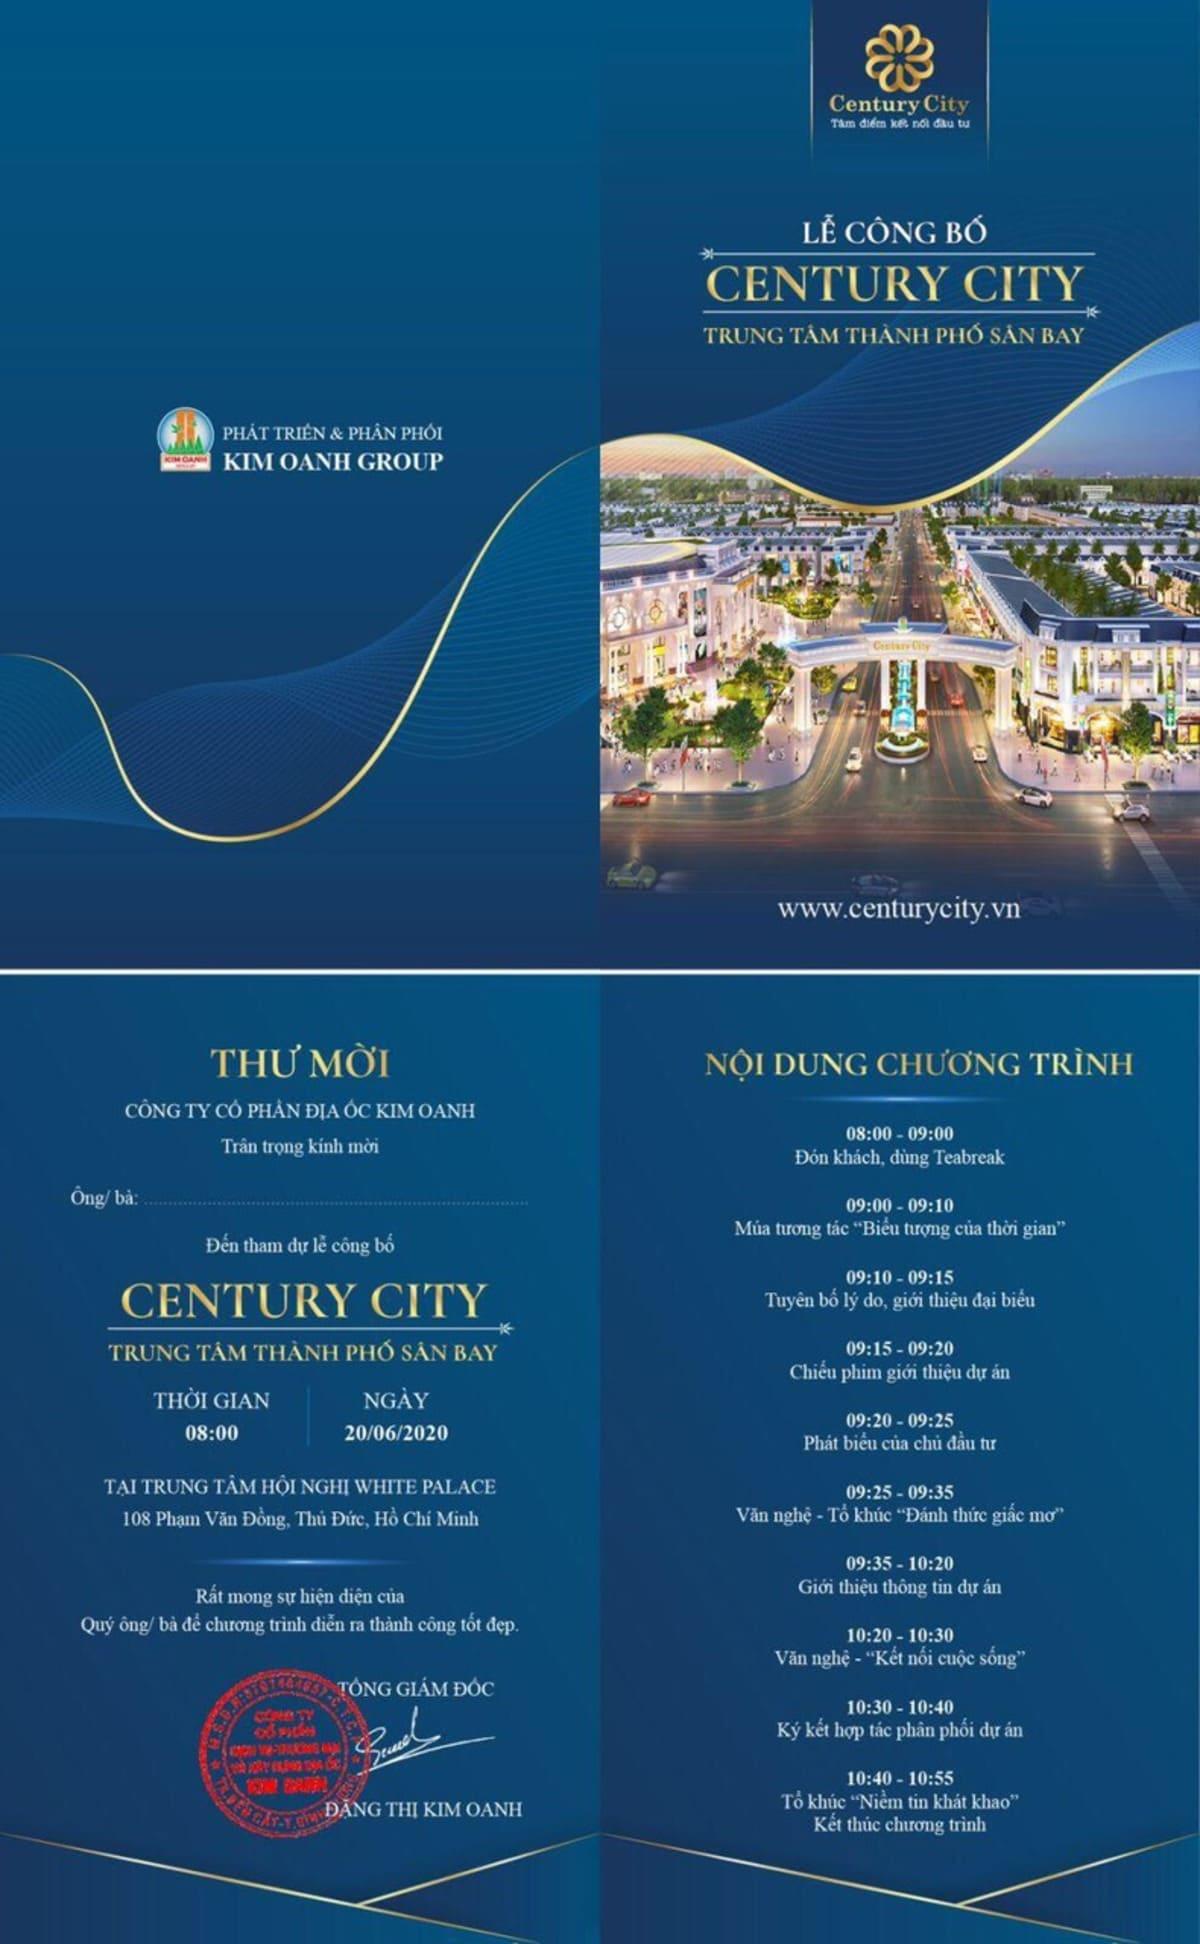 le cong bo century city - Lễ công bố Century City vào 20 06 2020